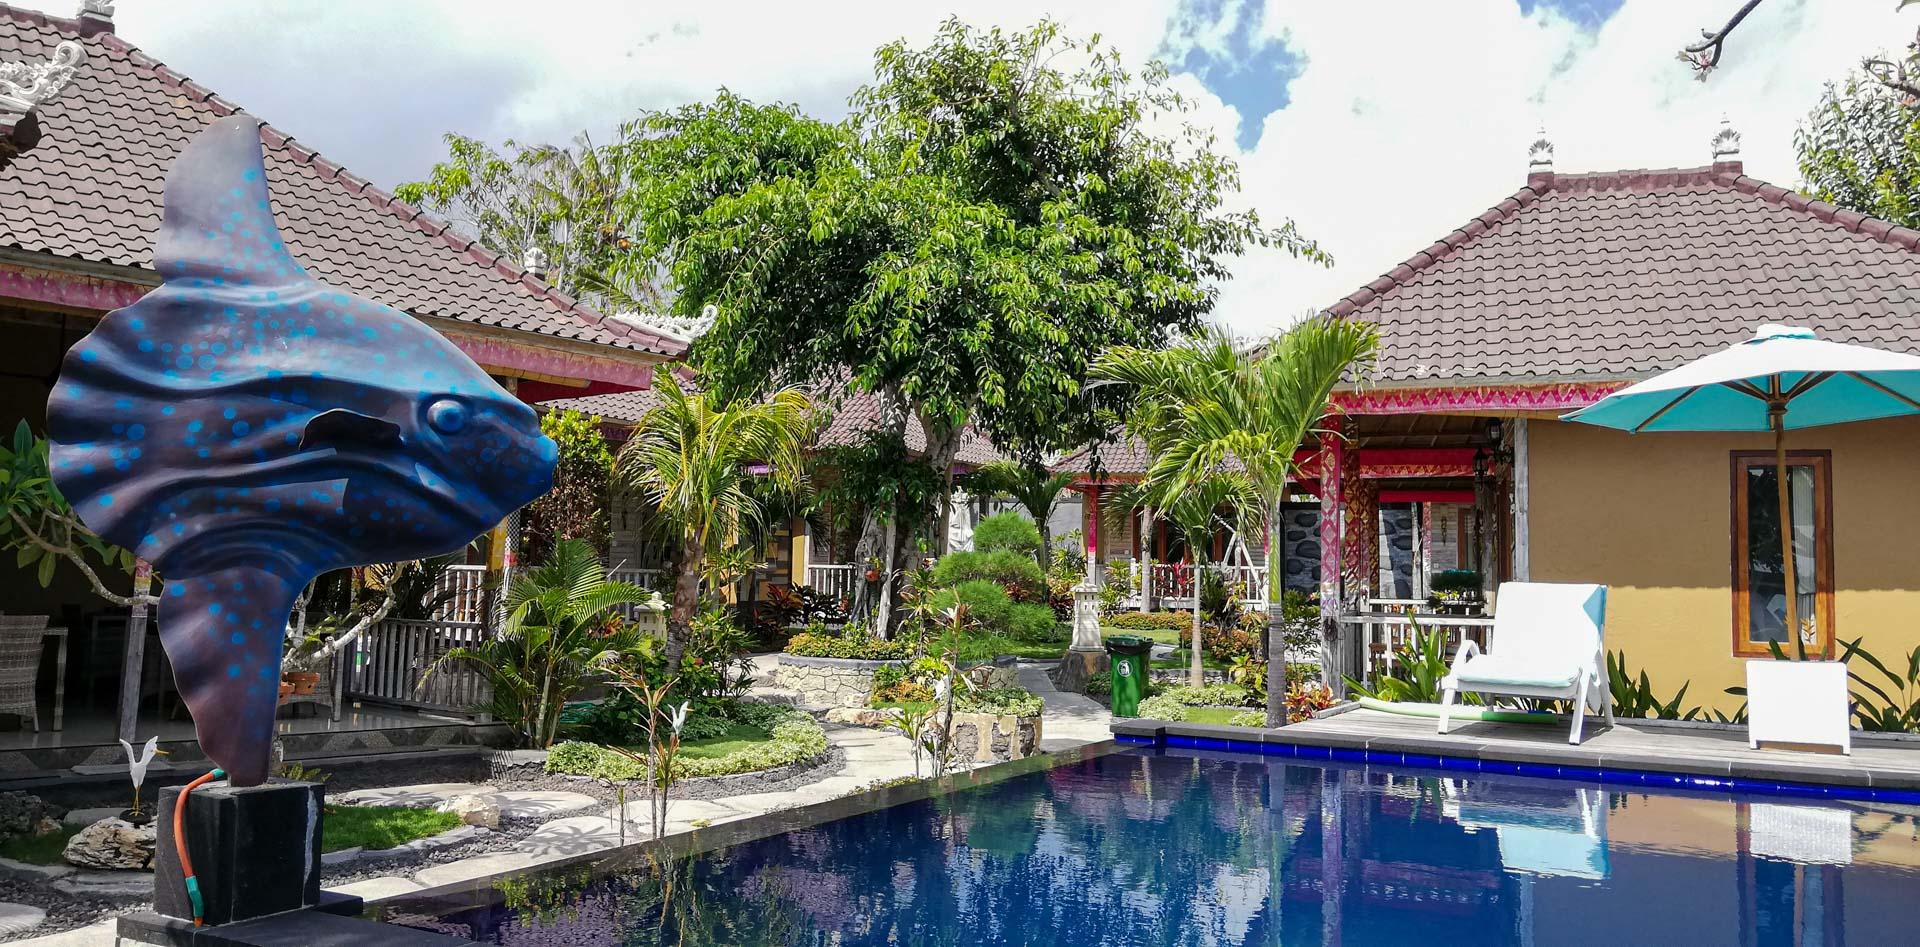 Blue Lagoon Secret Villas, nuestro alojamiento en Nusa Ceningan